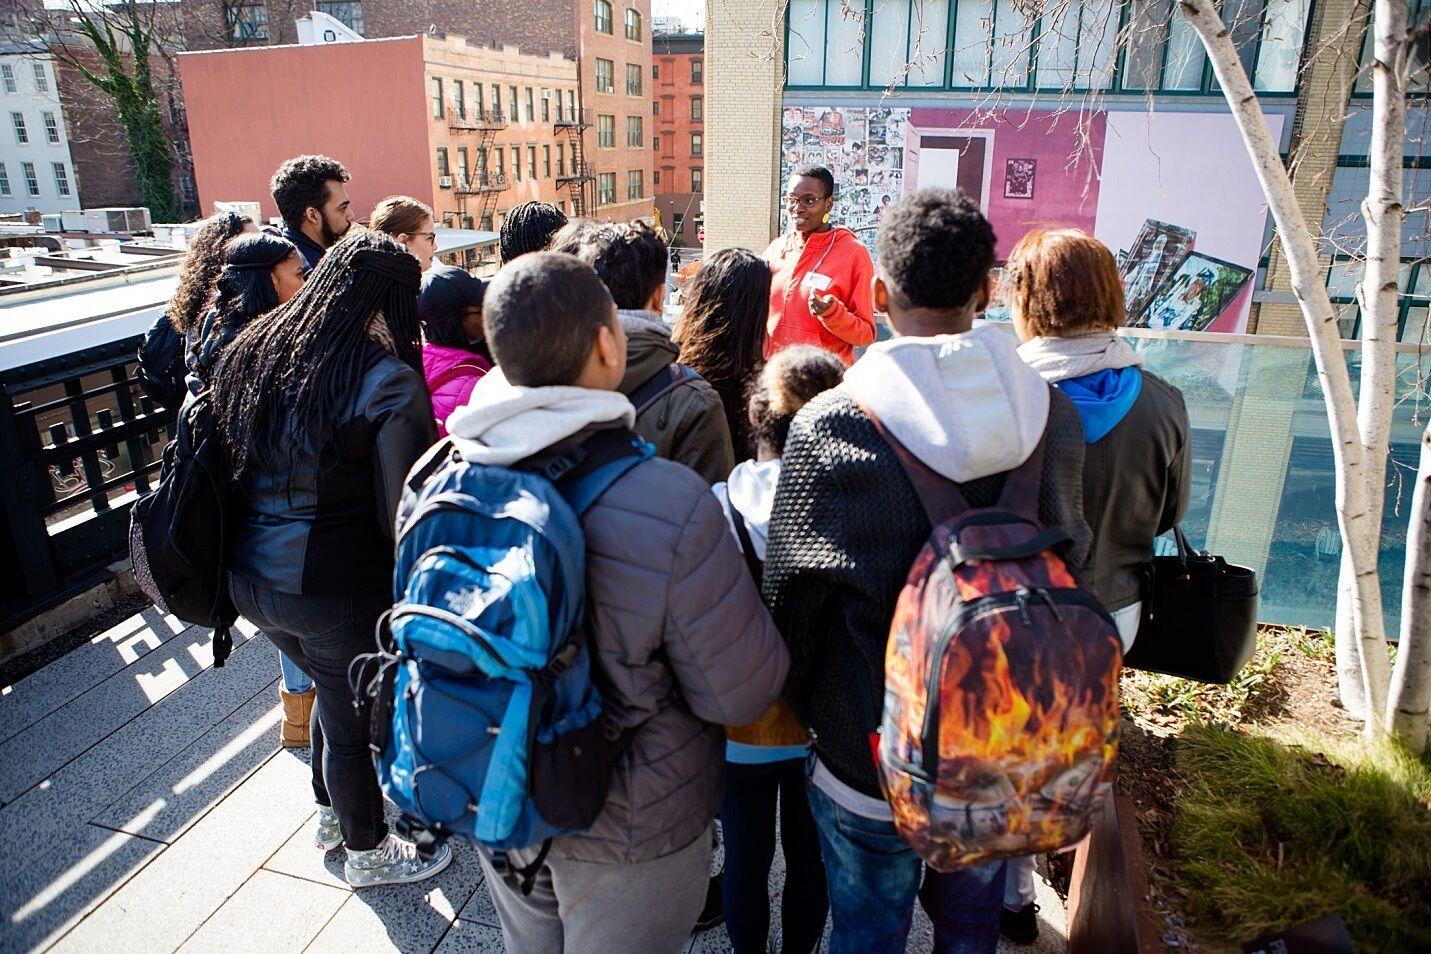 Students on a tour with artist Njideka Akunyili Crosby